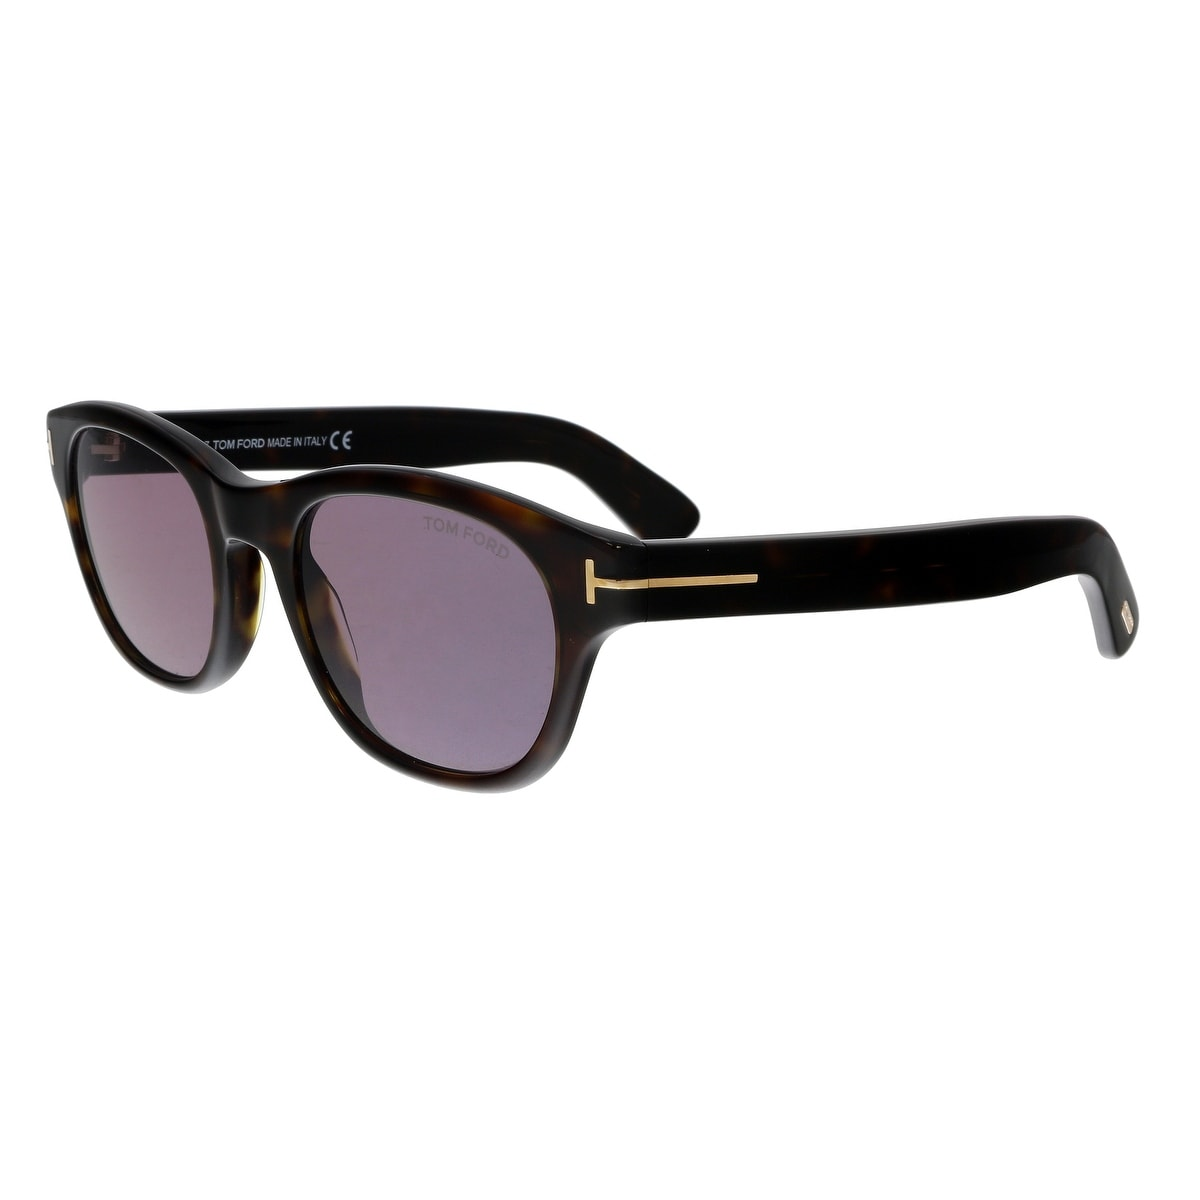 4ee187bc79041 Tom Ford FT0530 52Y O keefe Dark Havana Rectangular Sunglasses - No Size